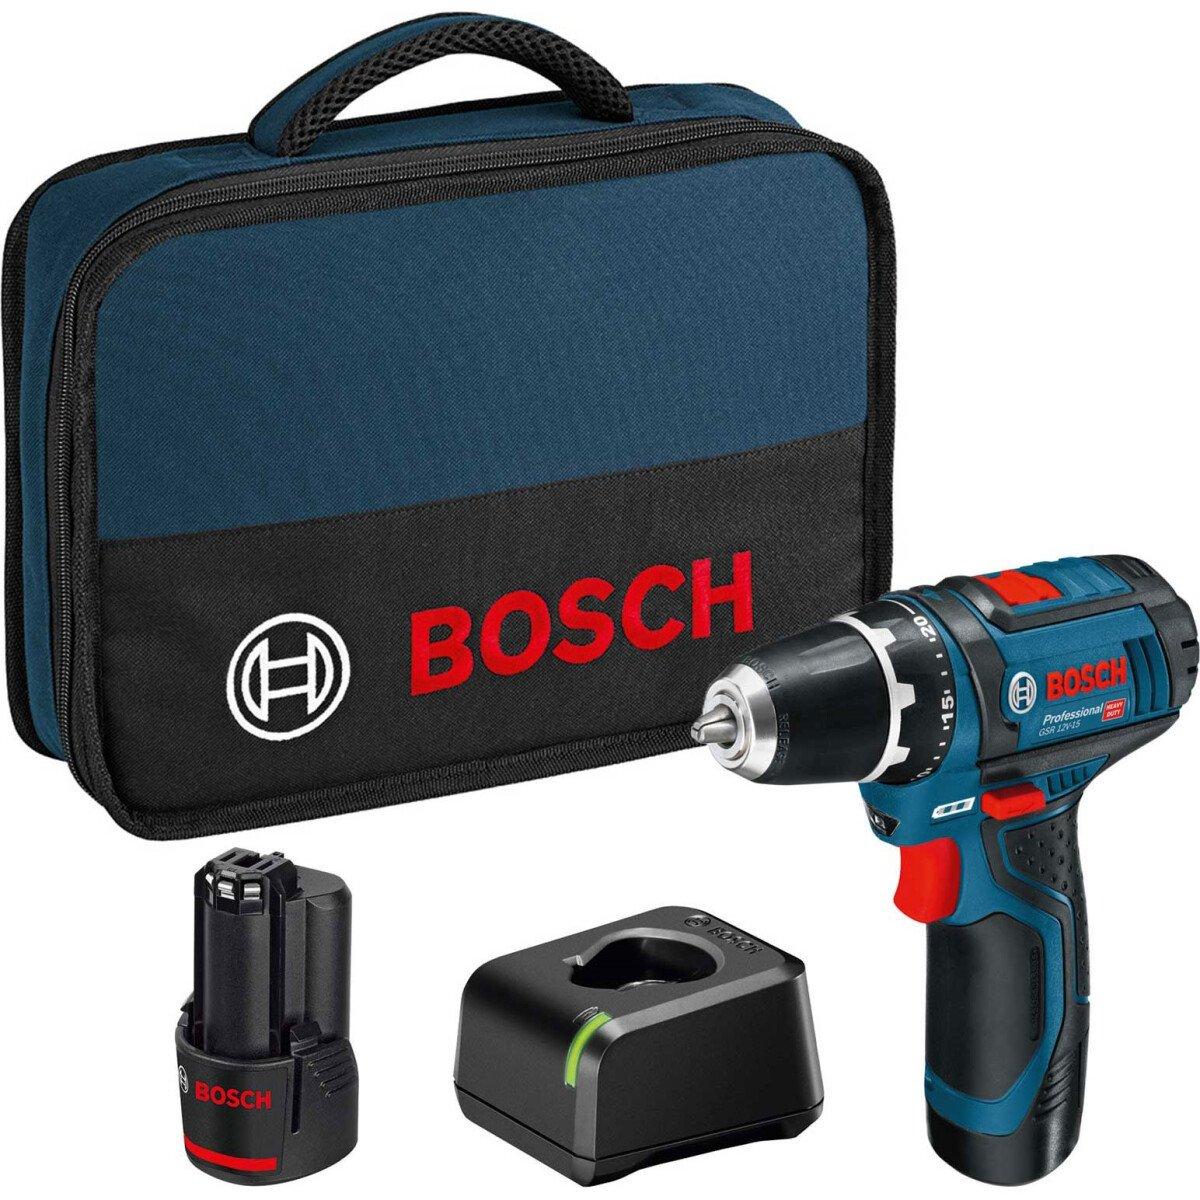 Bosch GSR 12V-15 12V Drill/Driver with 2x 2.0Ah Batteries in Tool Bag